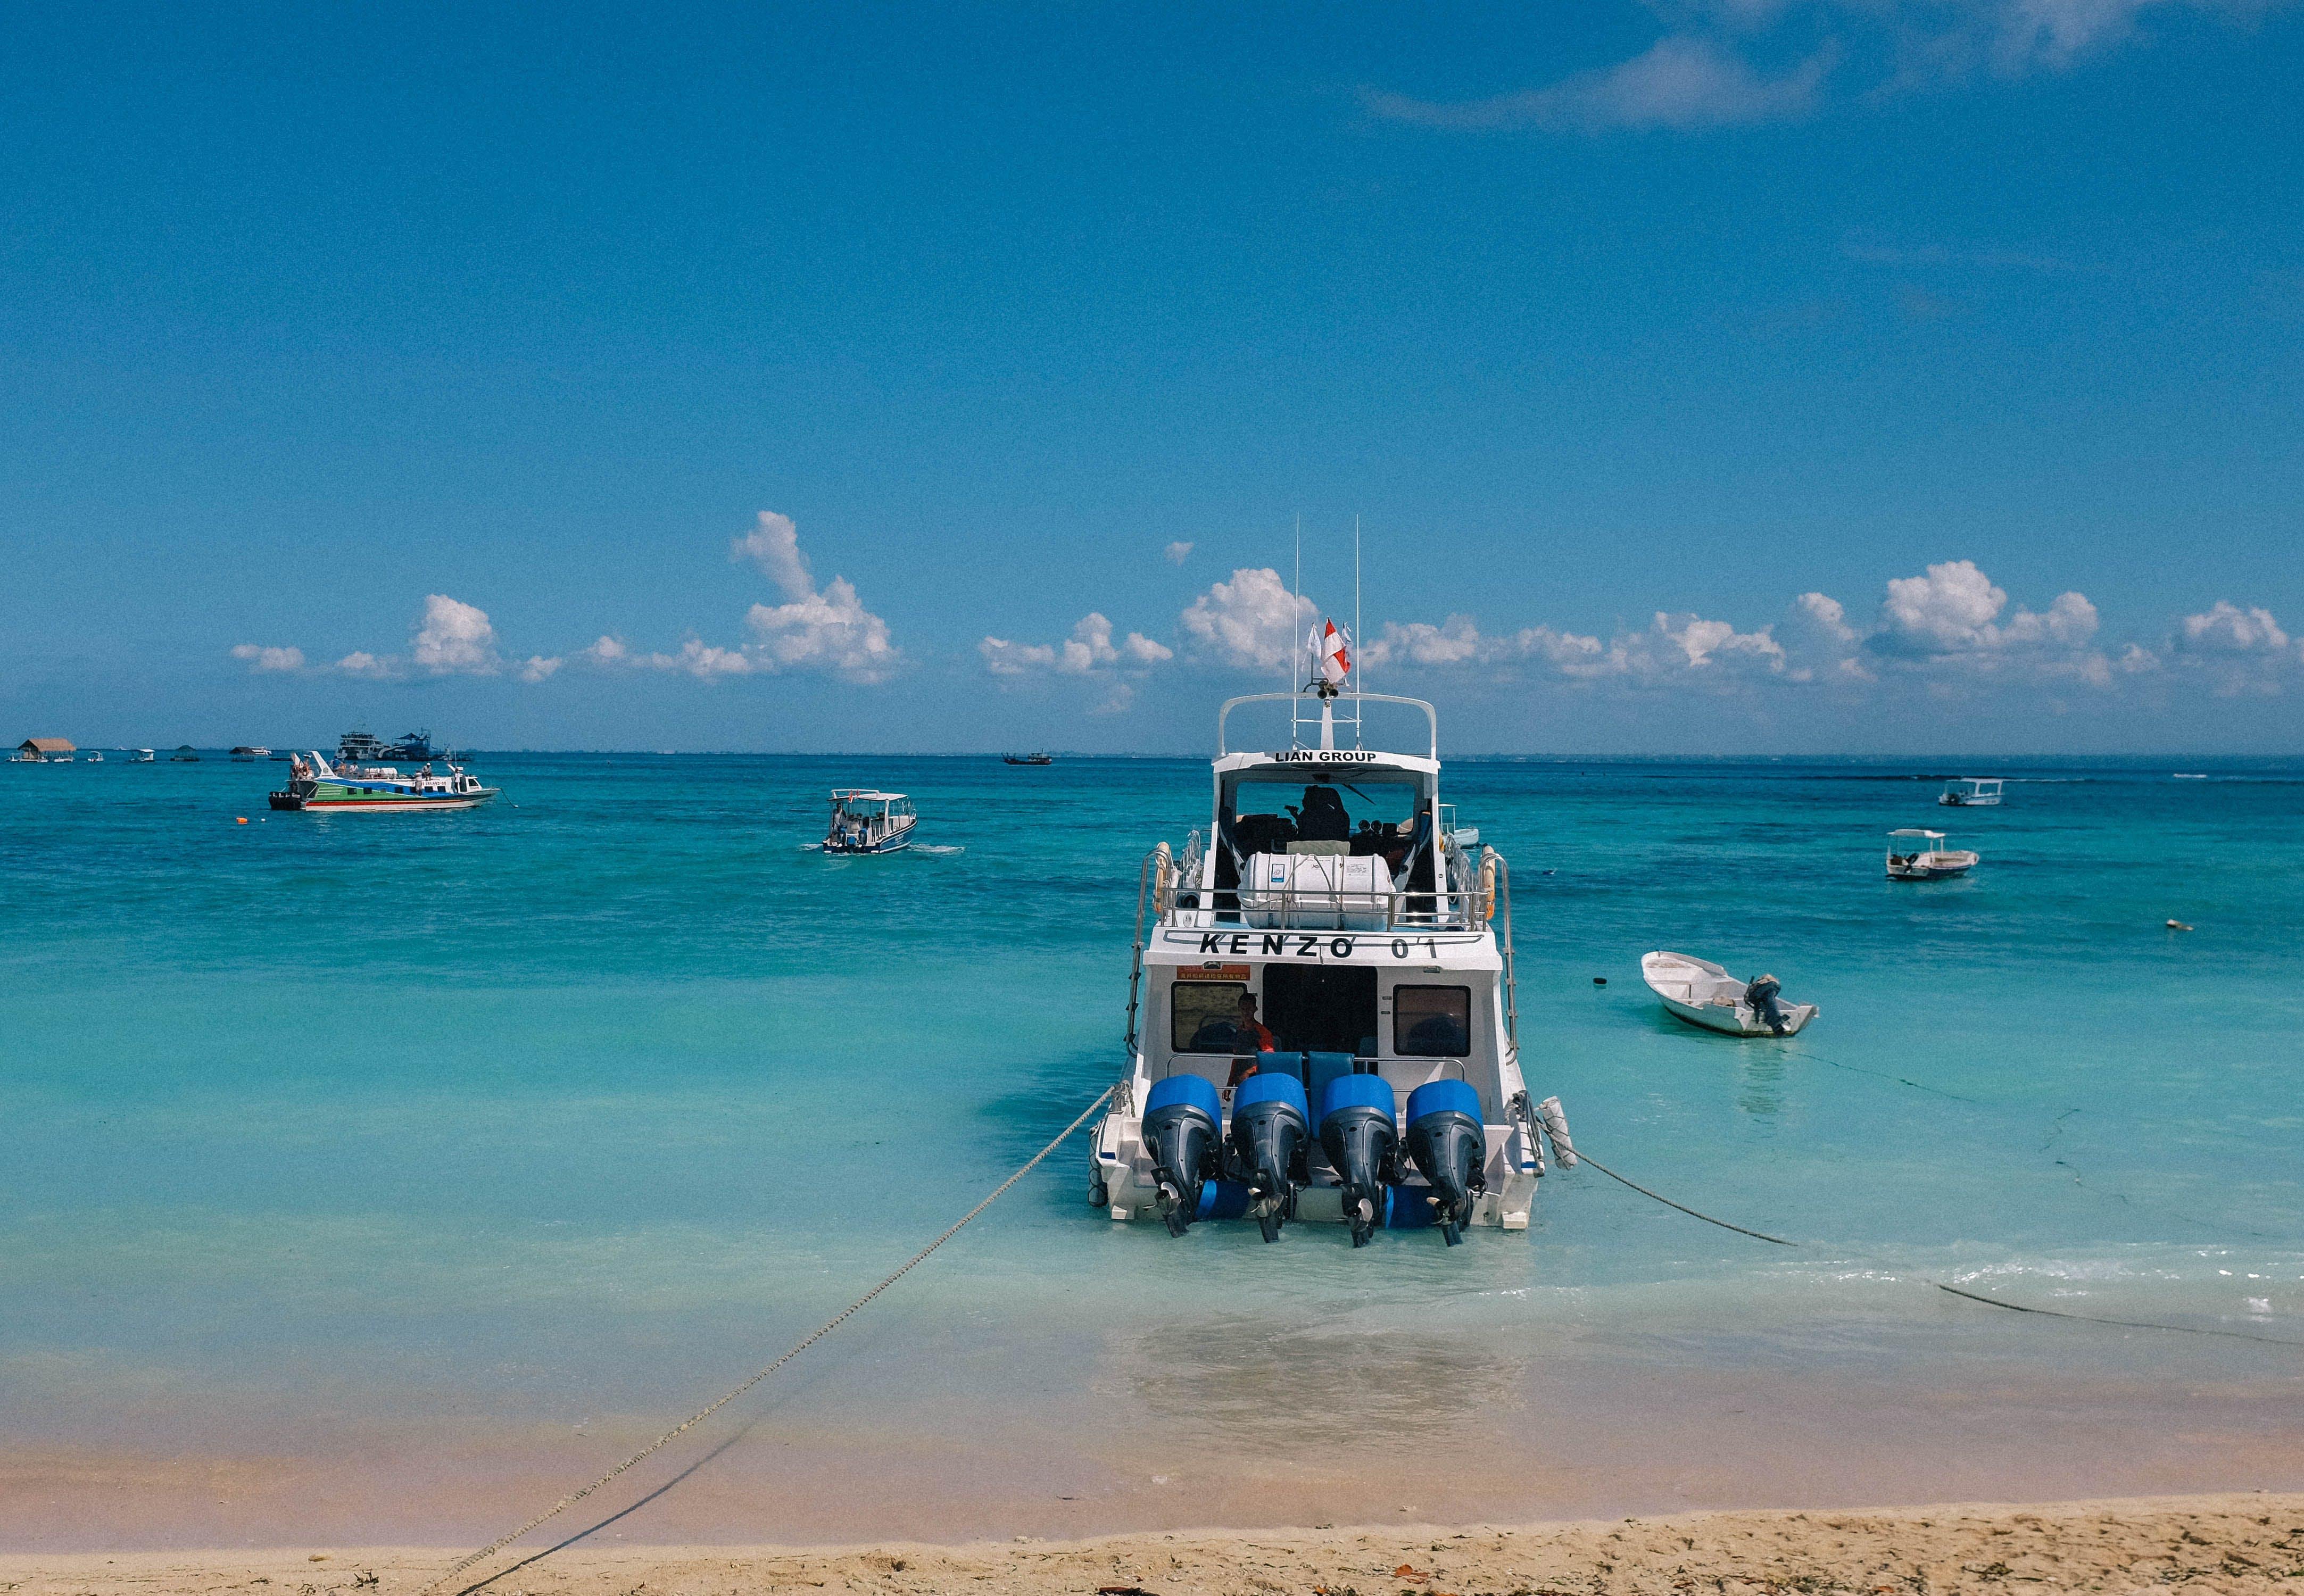 Fotos de stock gratuitas de azul, bali, barca, belleza en la naturaleza